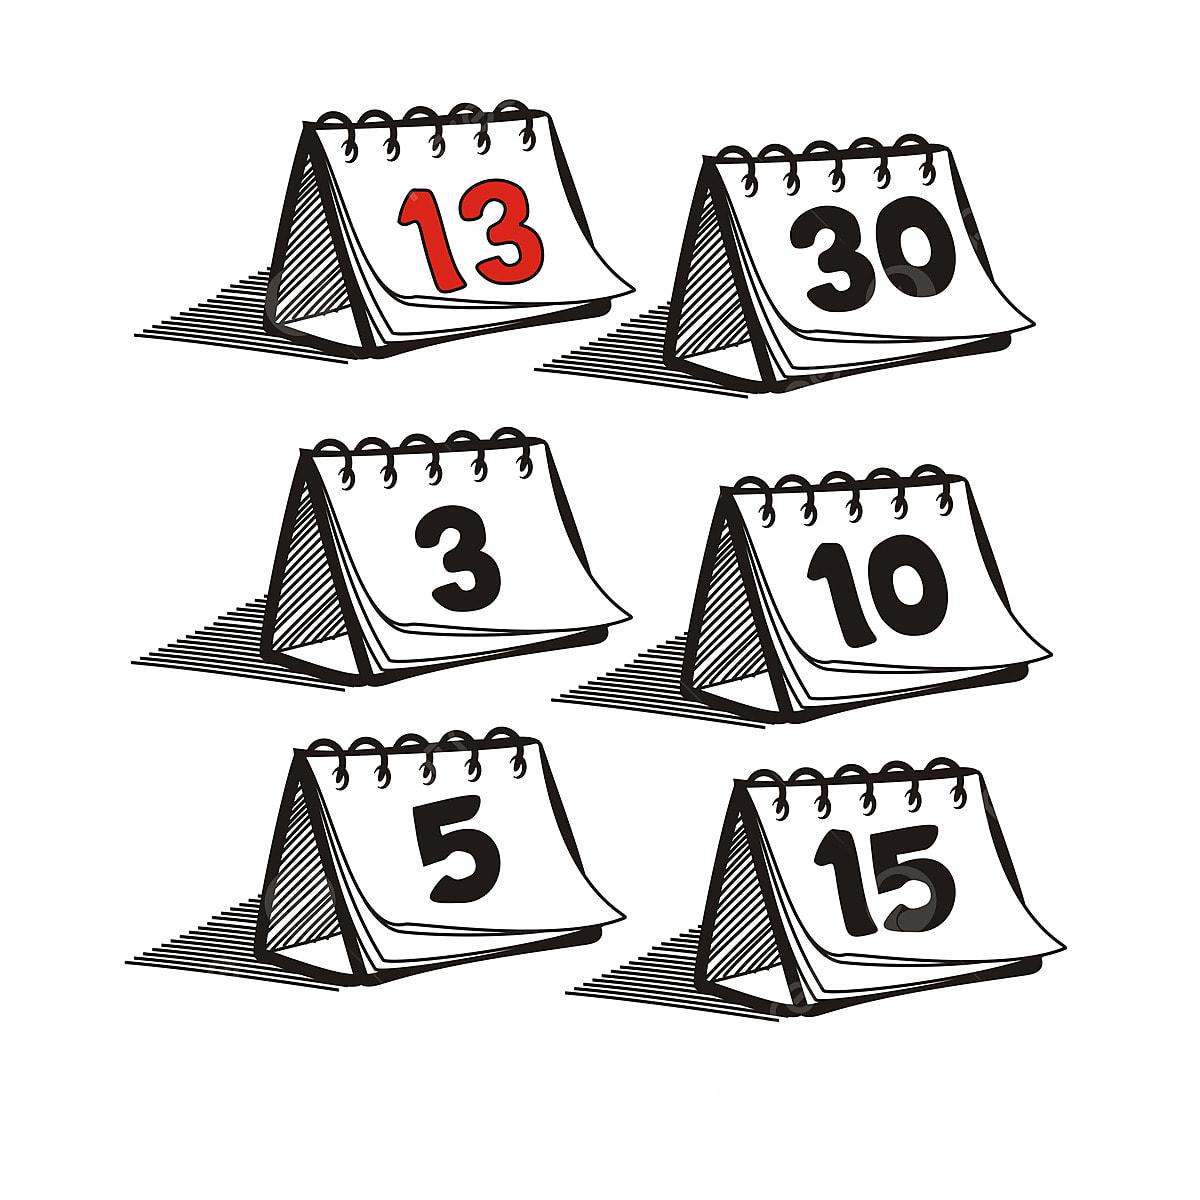 Calendario Dibujo Png.Conjunto De Calendario Diario Dibujo Hecho A Mano Resumen